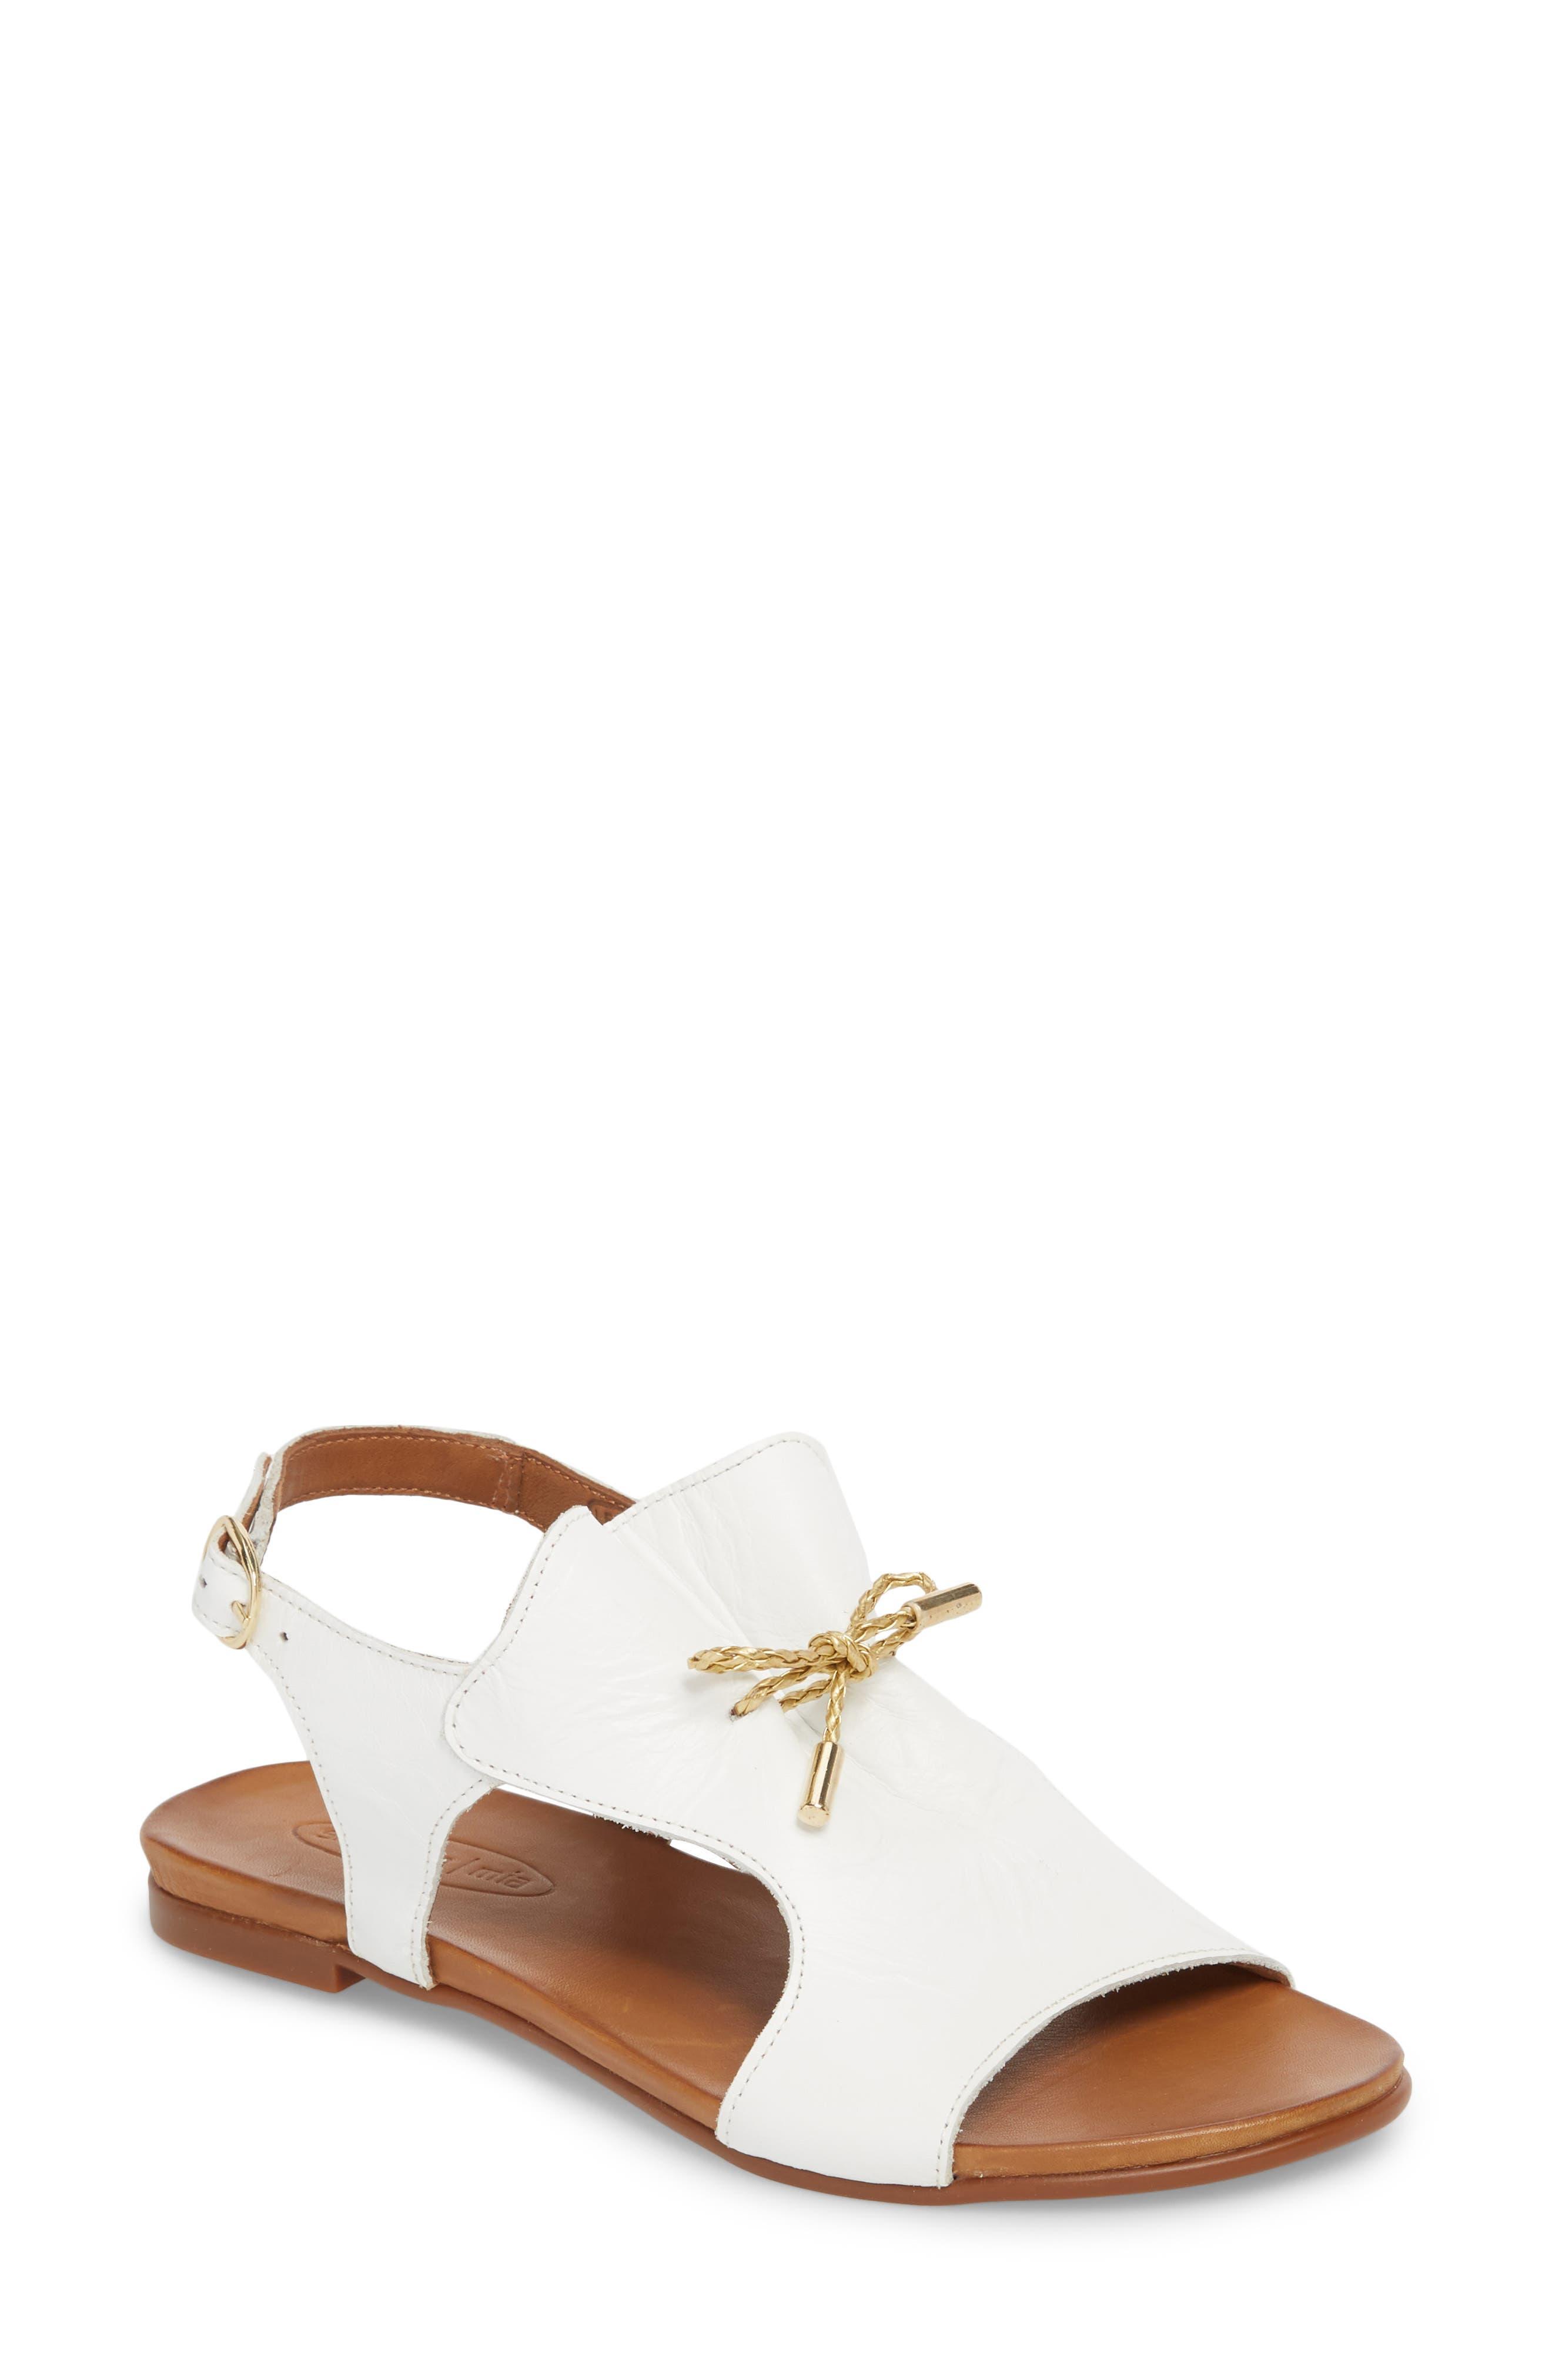 Sheridan Mia Tai Sandal, White